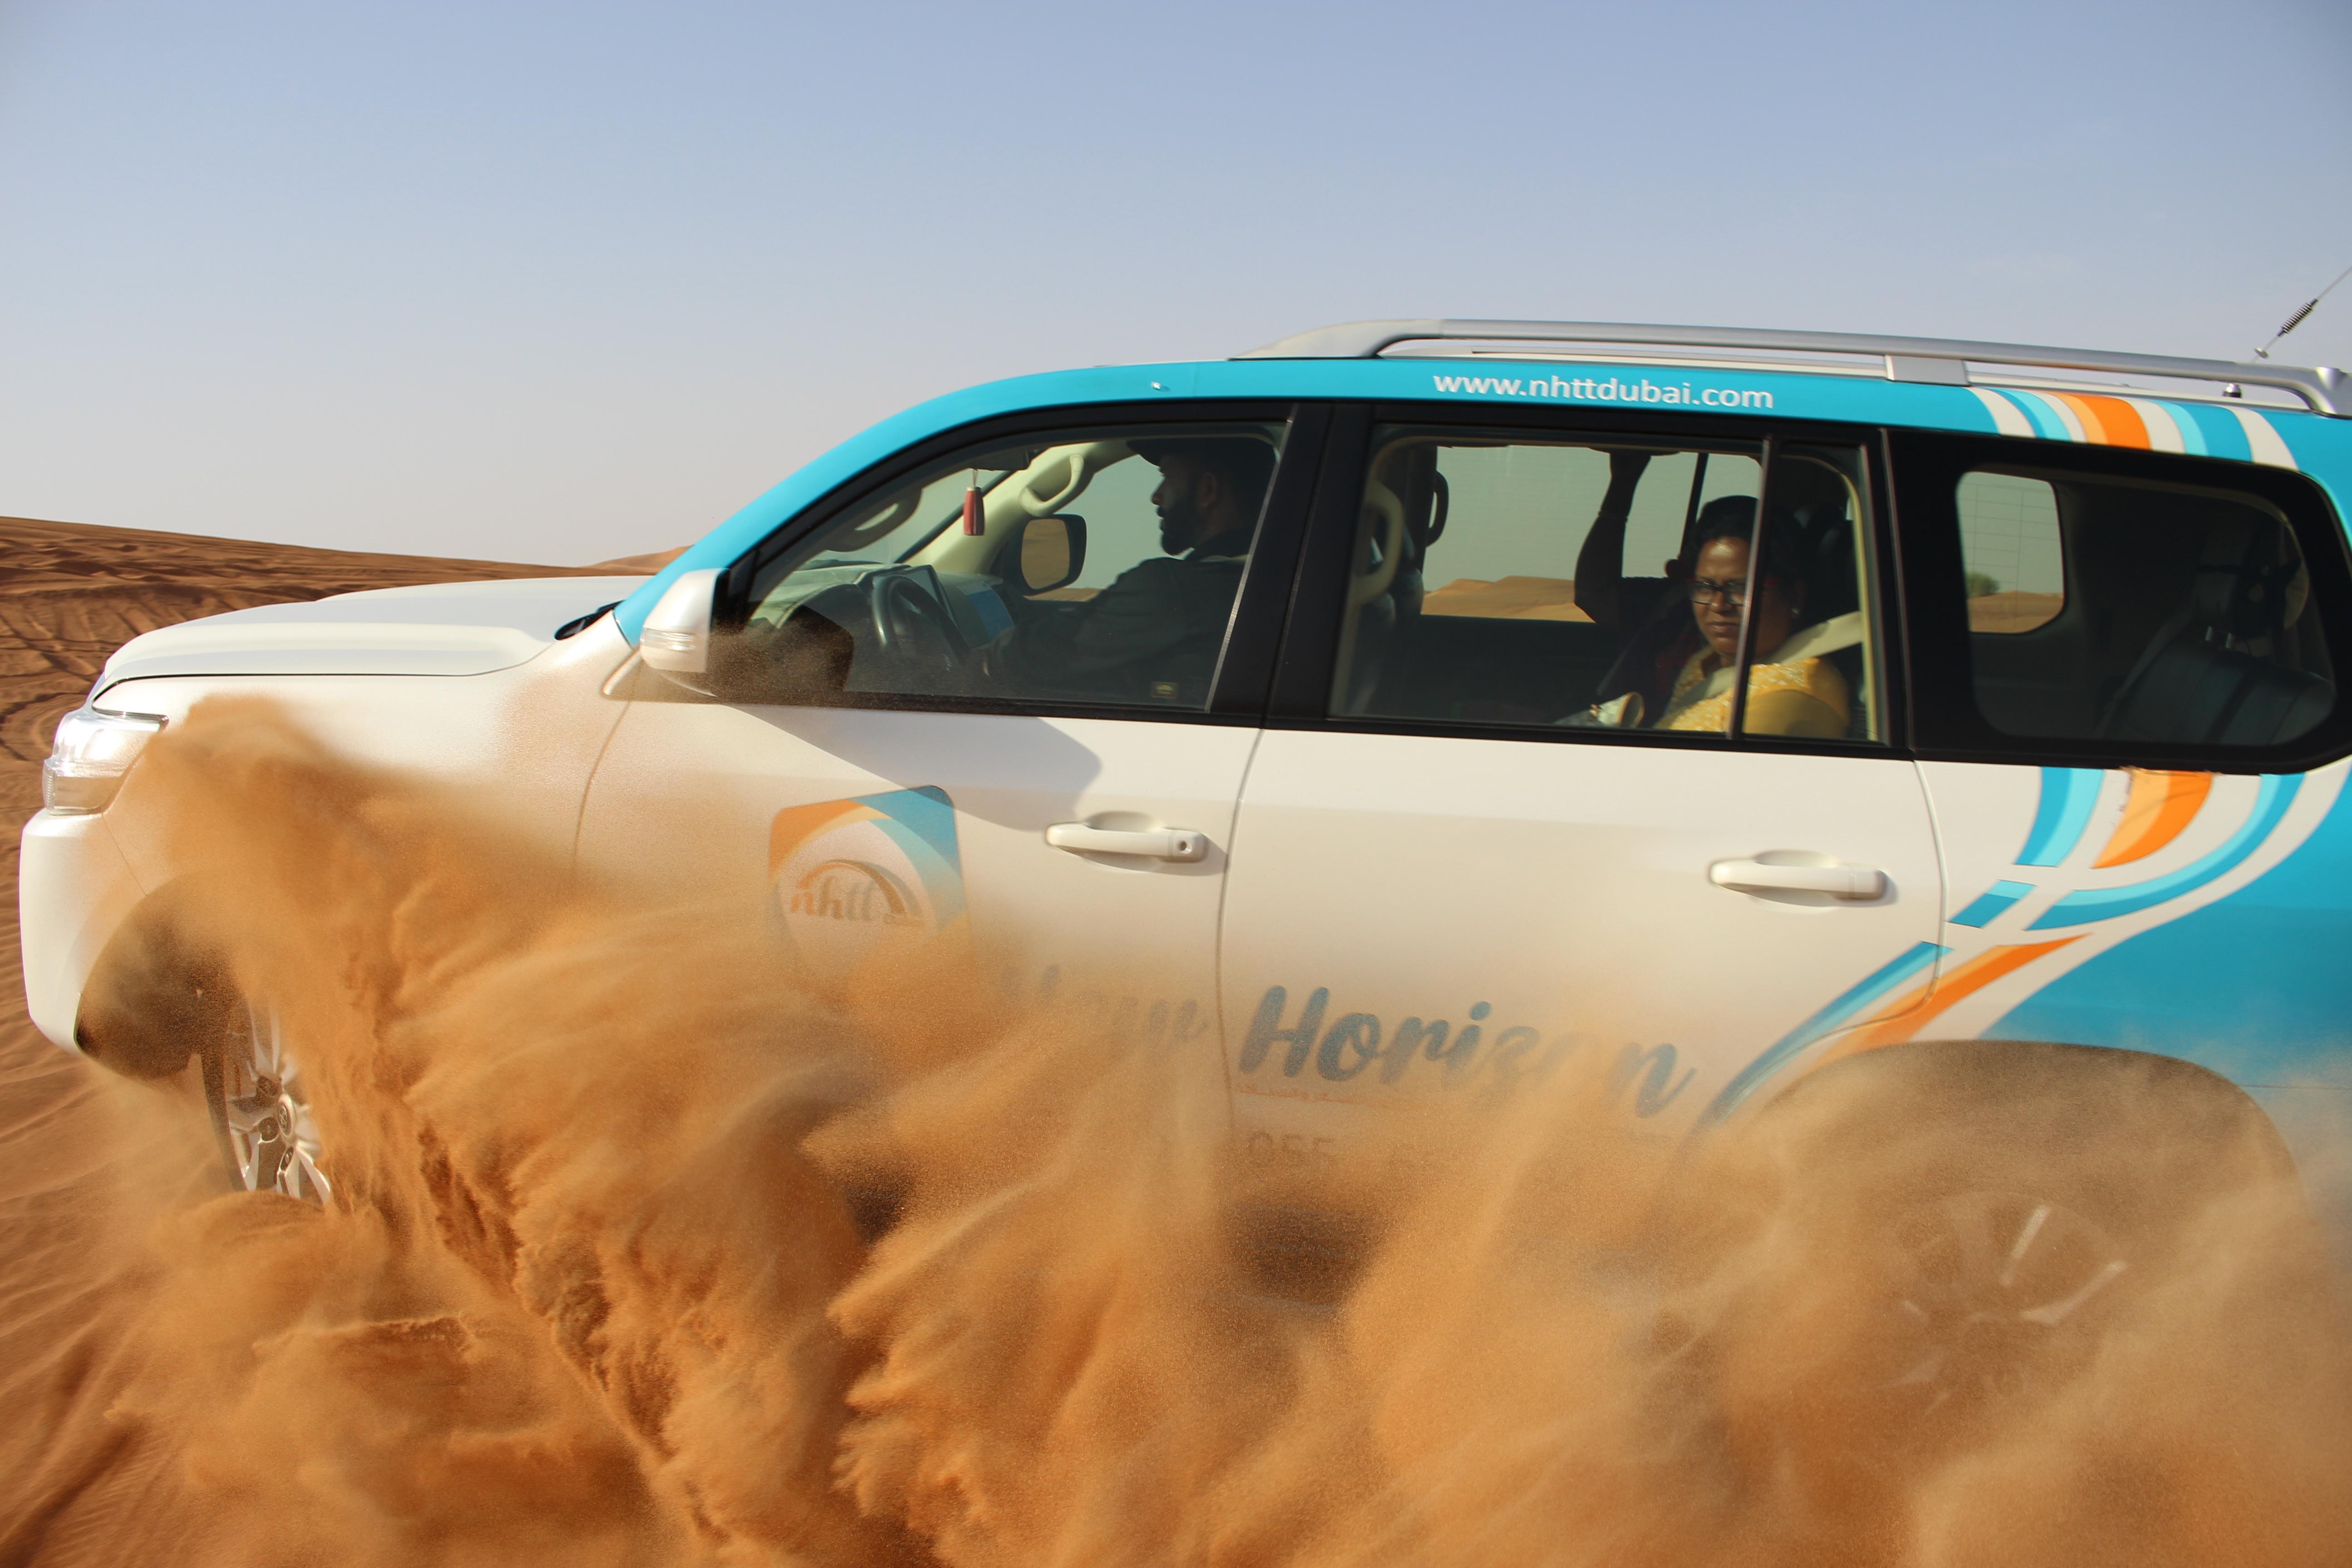 Desert Safari + Wild Wadi Park Tour Package